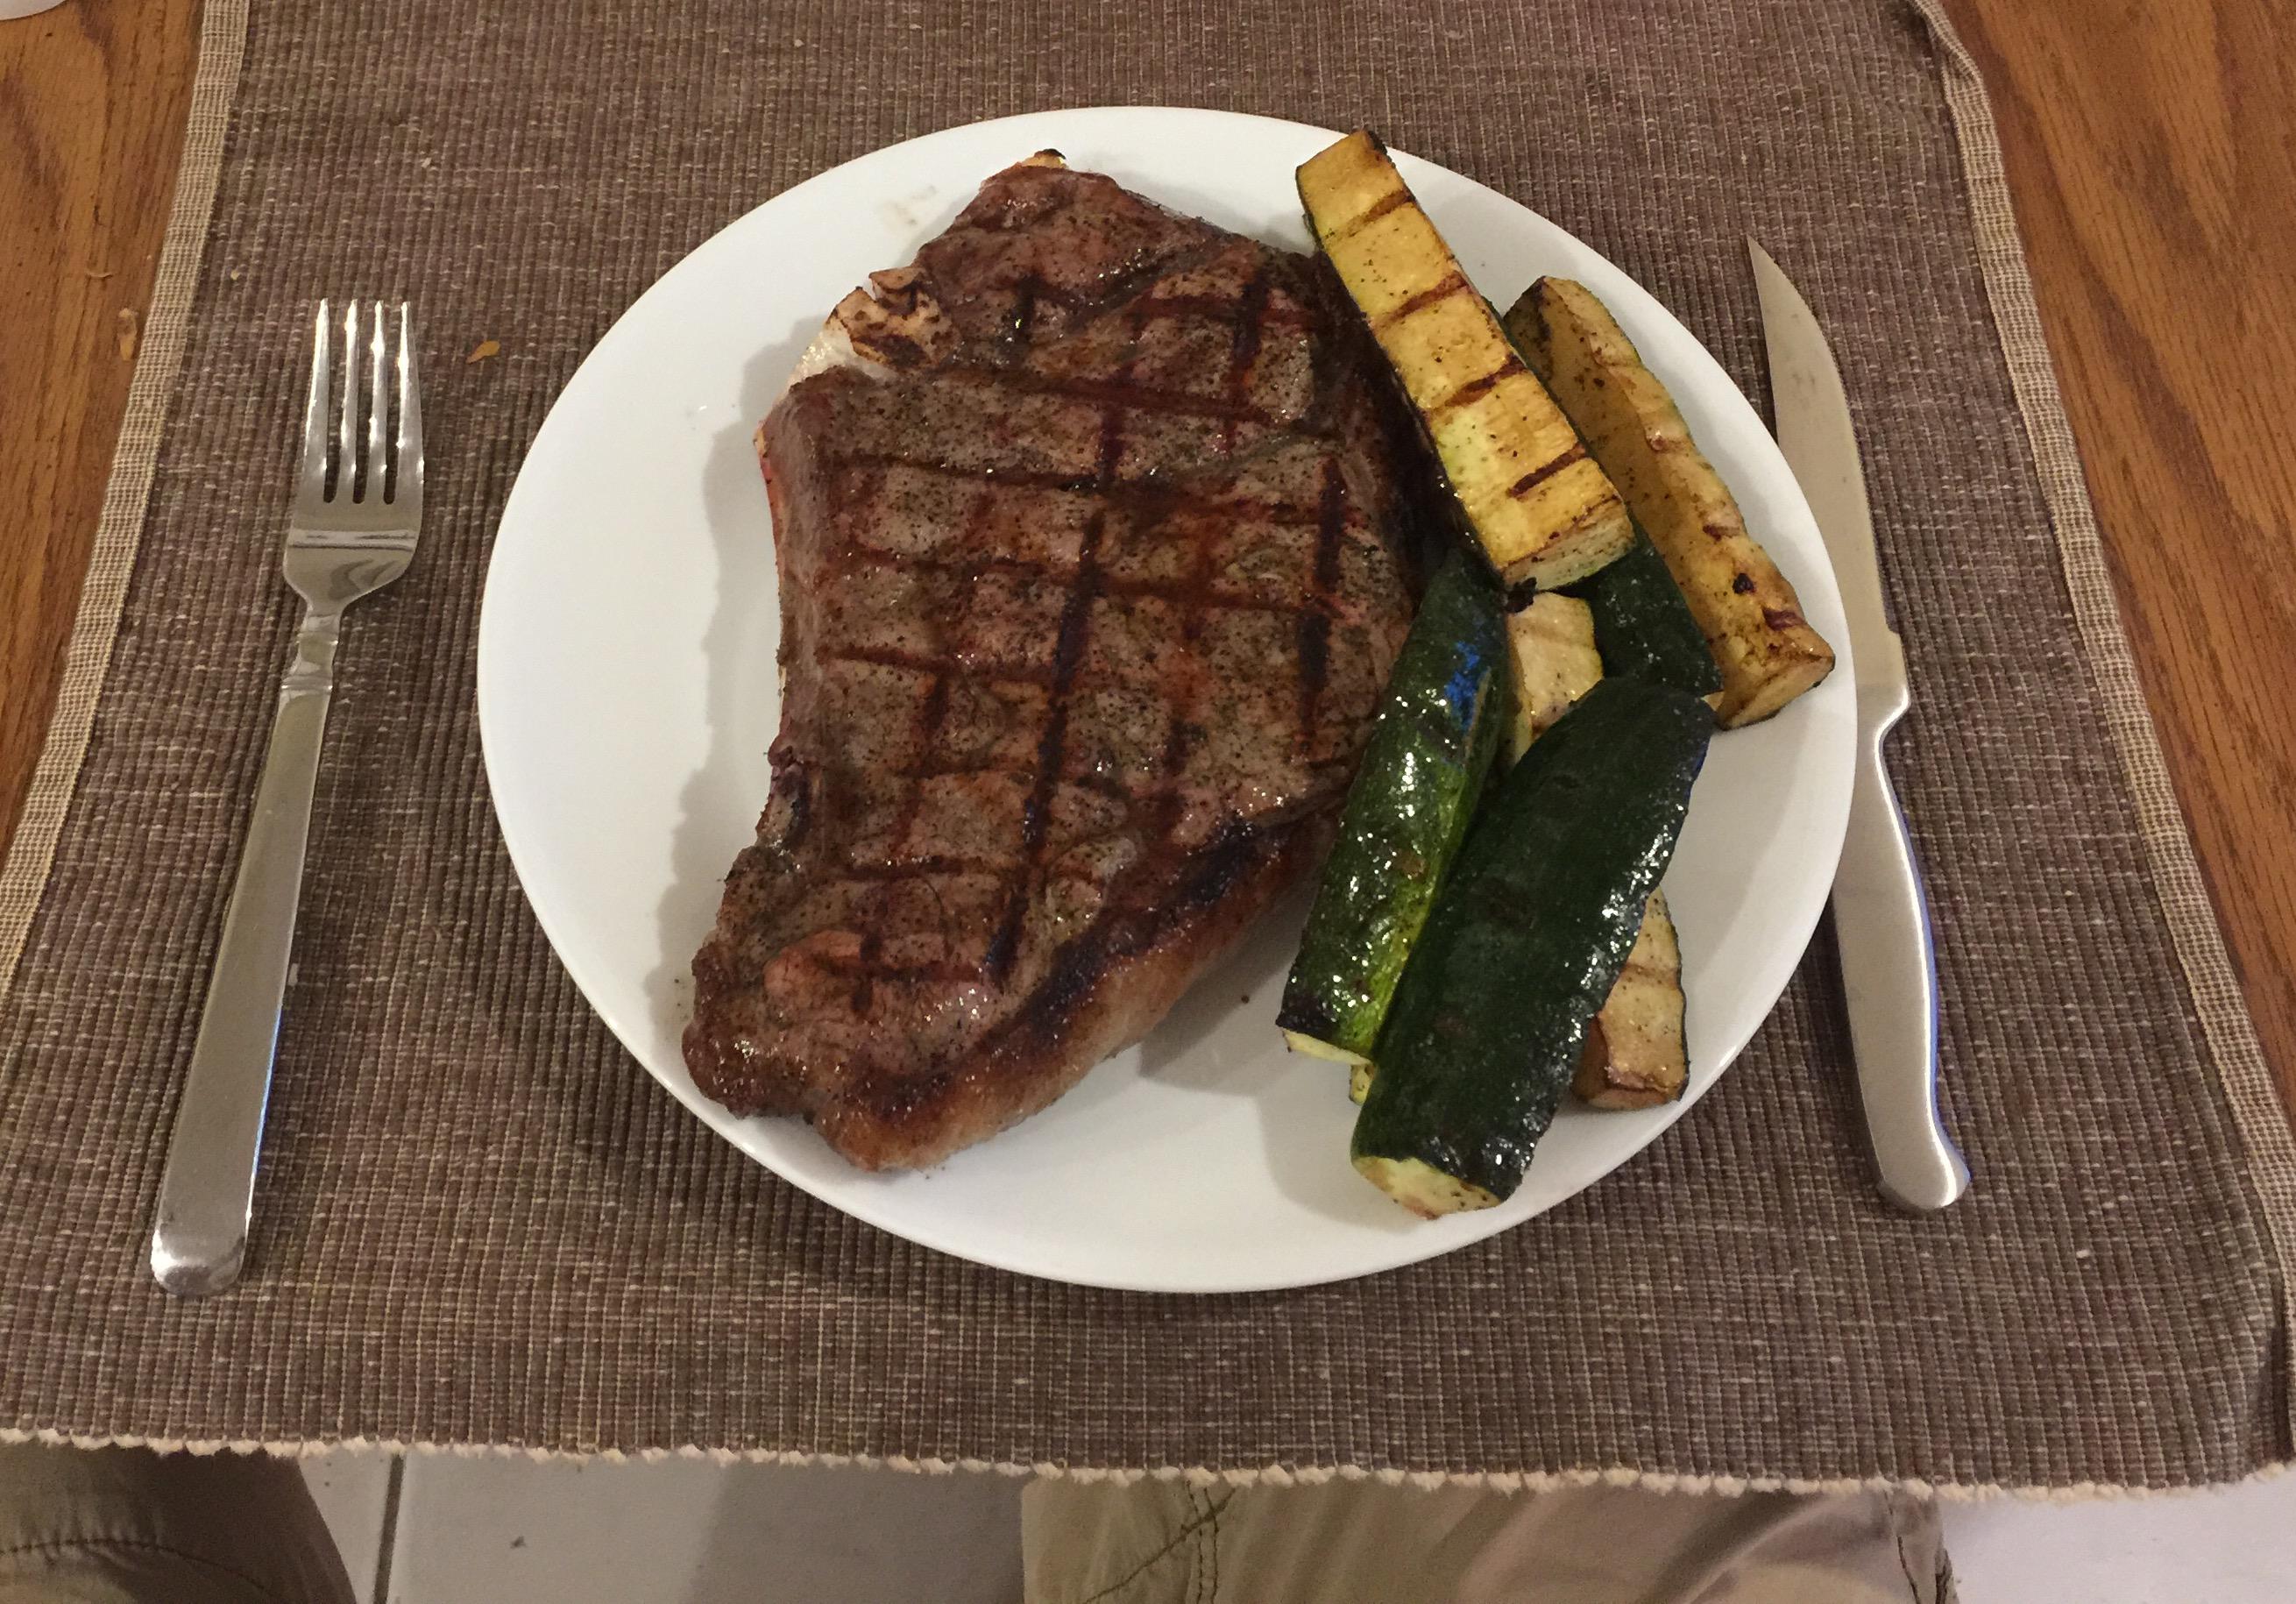 Home Plainville CT :: seasoned steak and zucchini